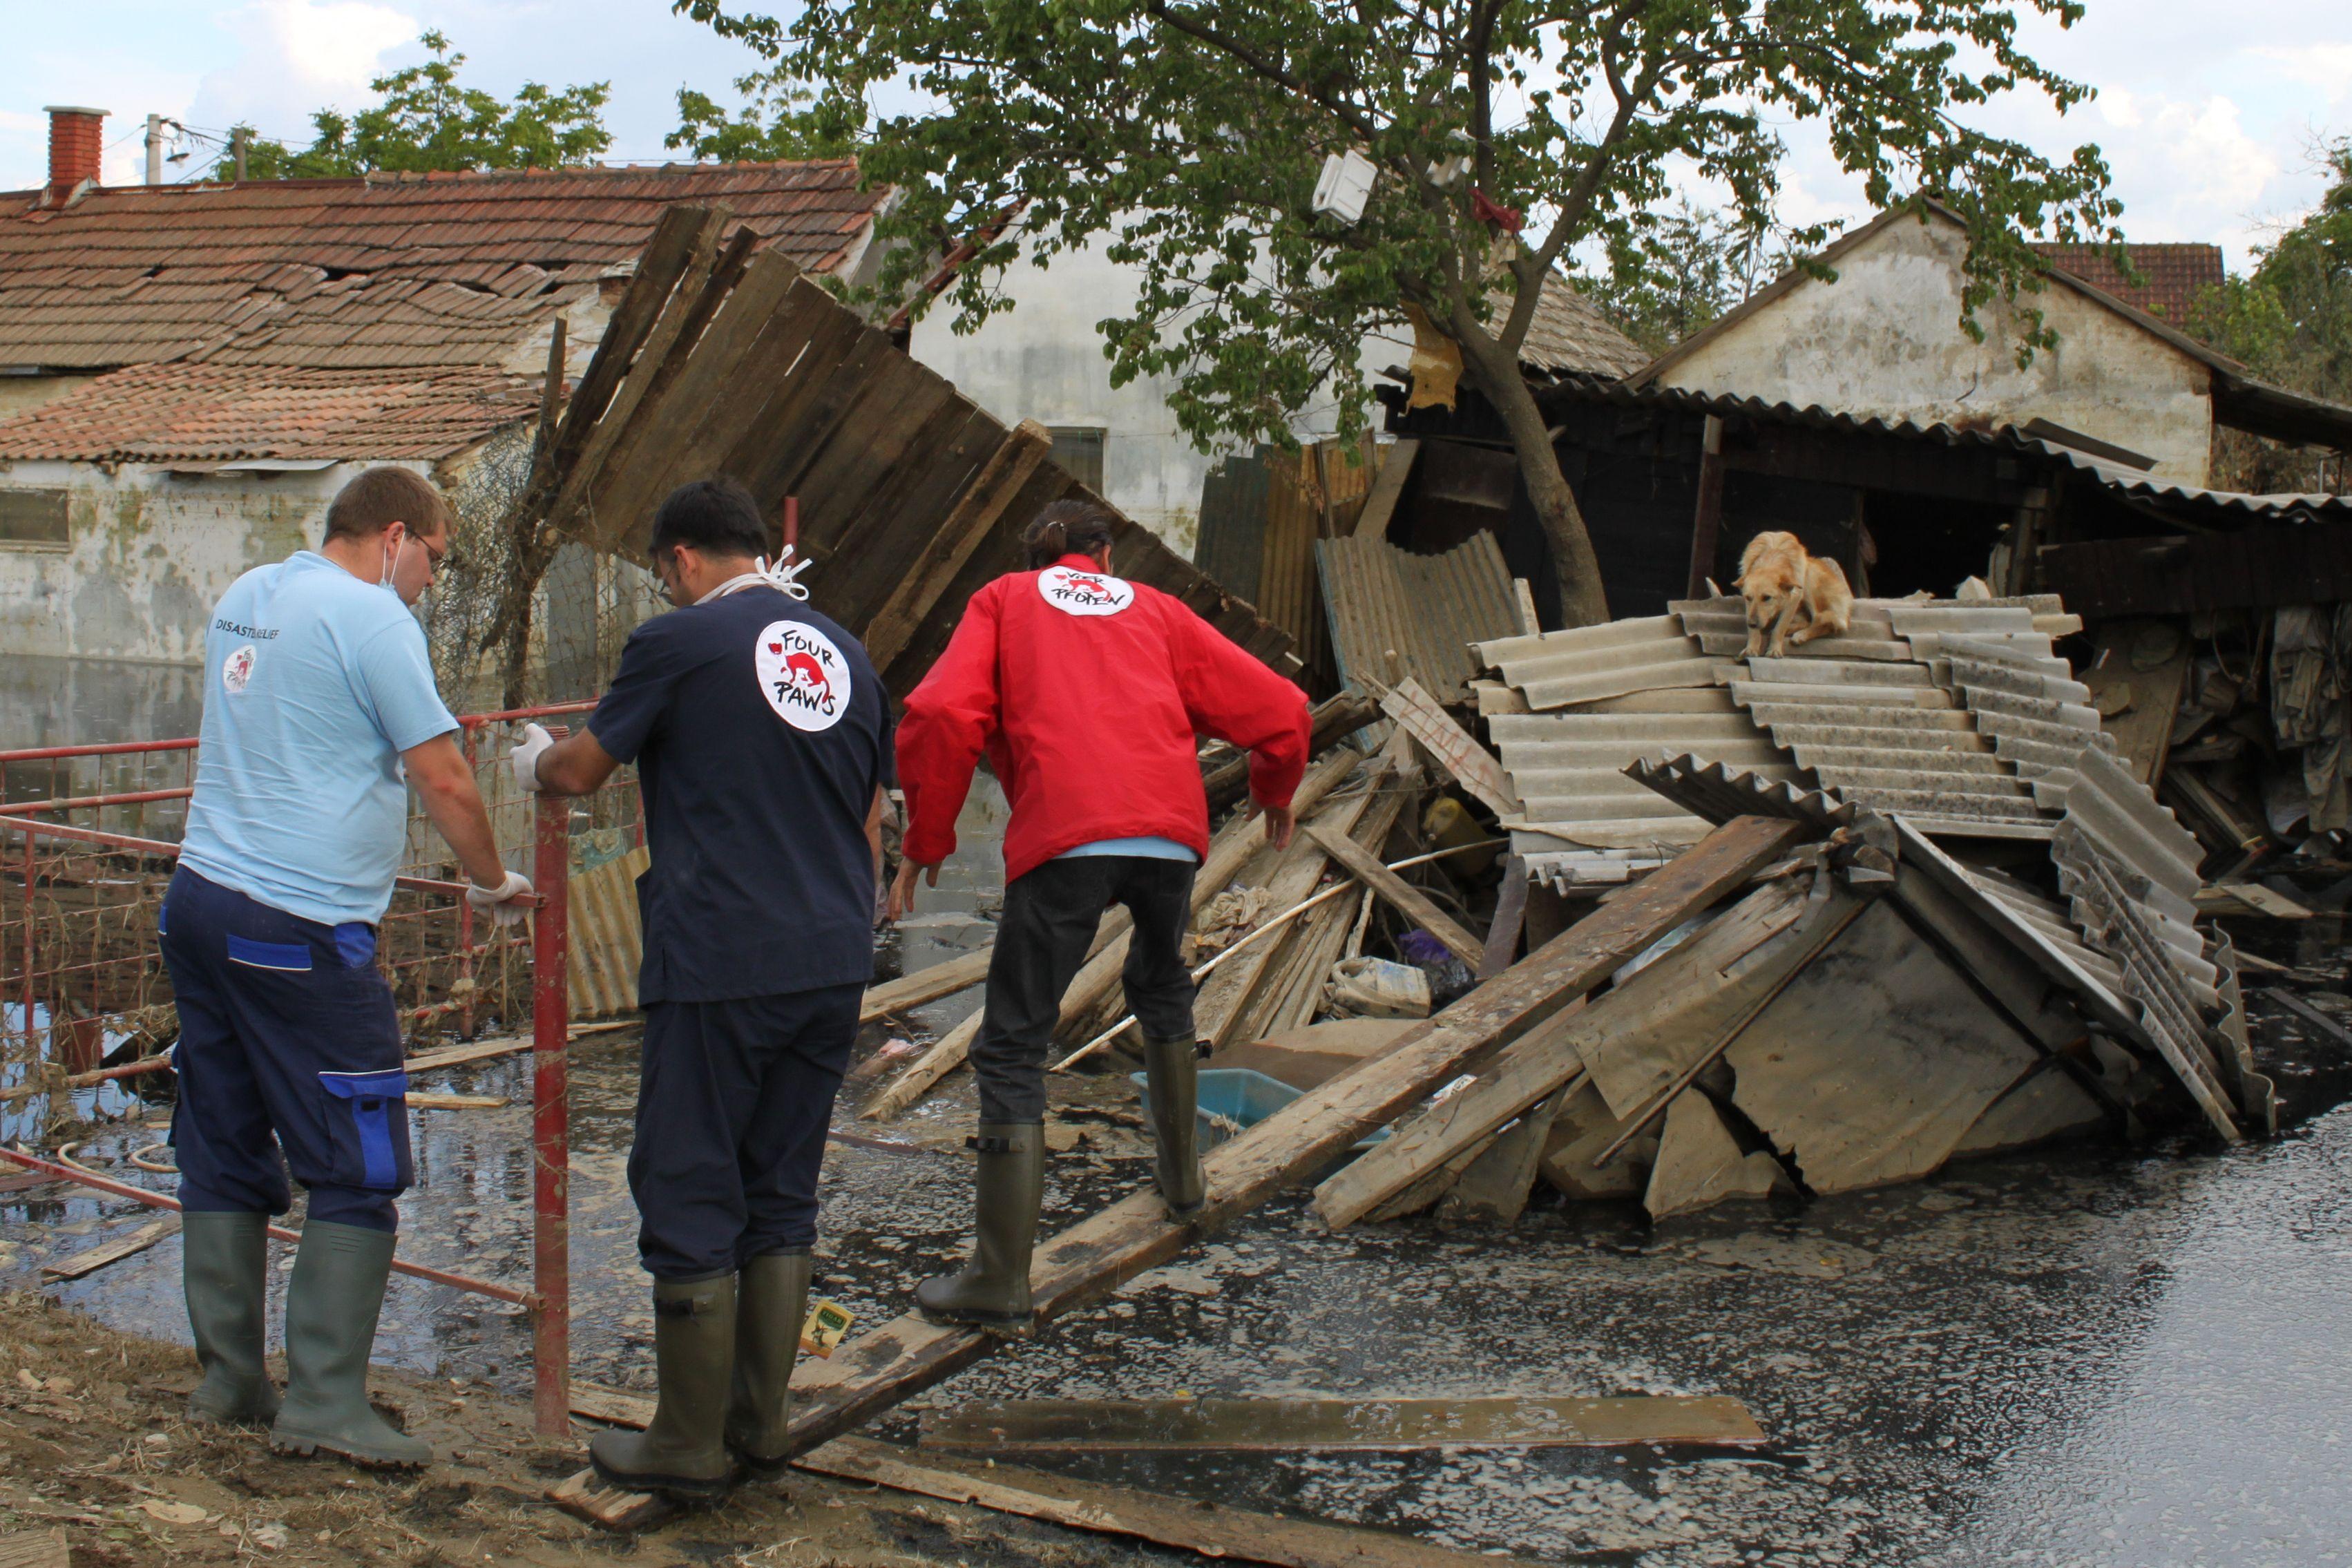 Hilfe für Tiere in Katastrophengebieten